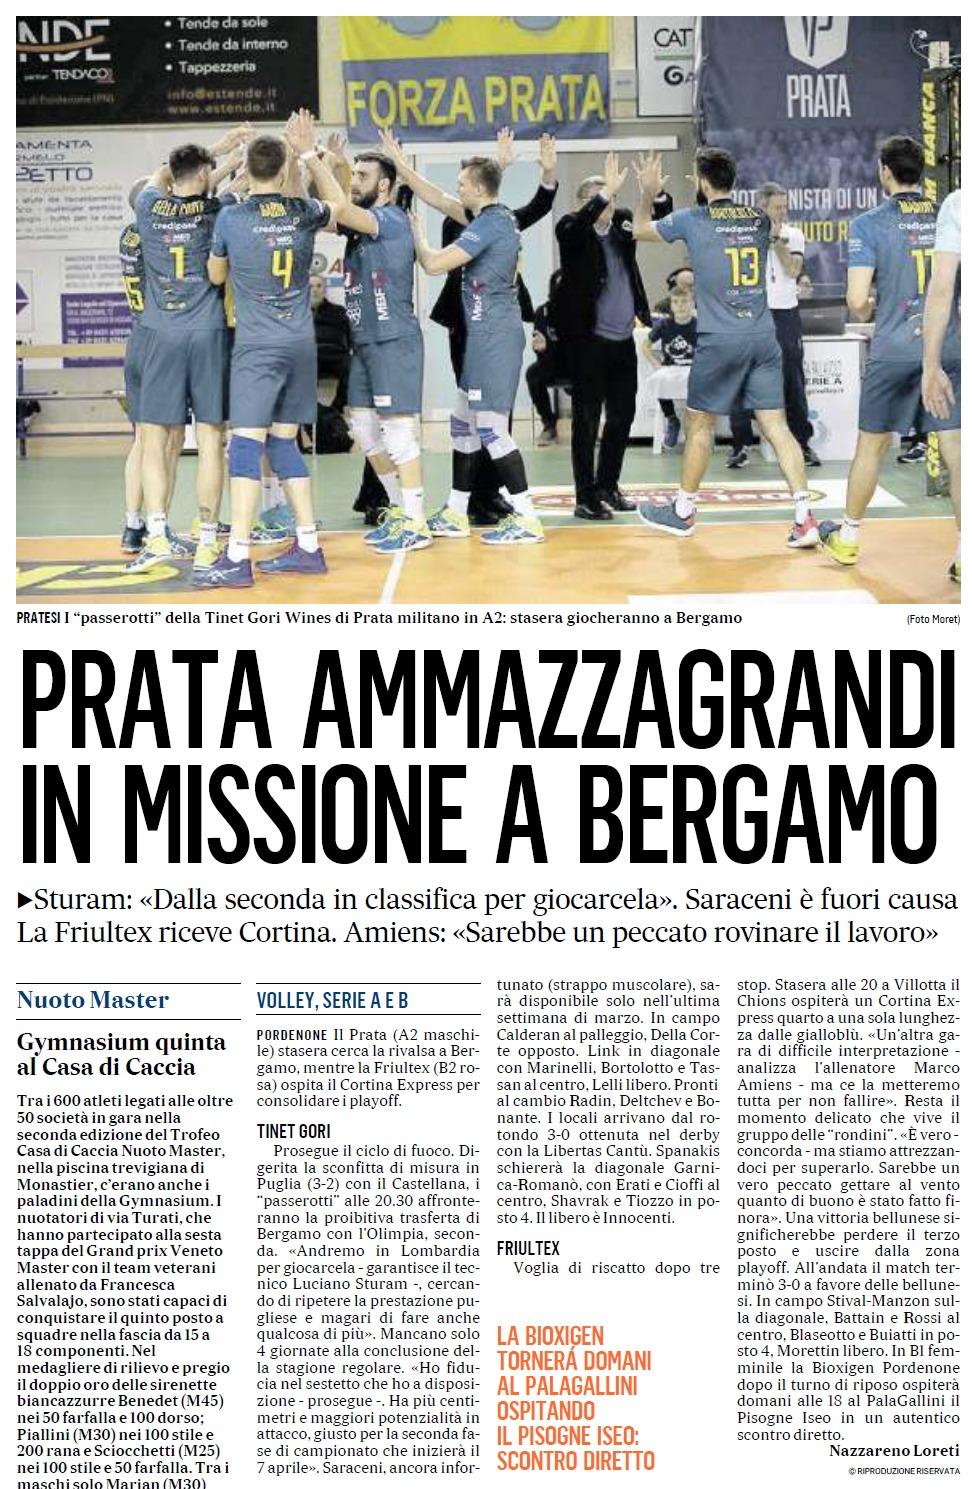 Gazzettino-9-Marzo.jpg